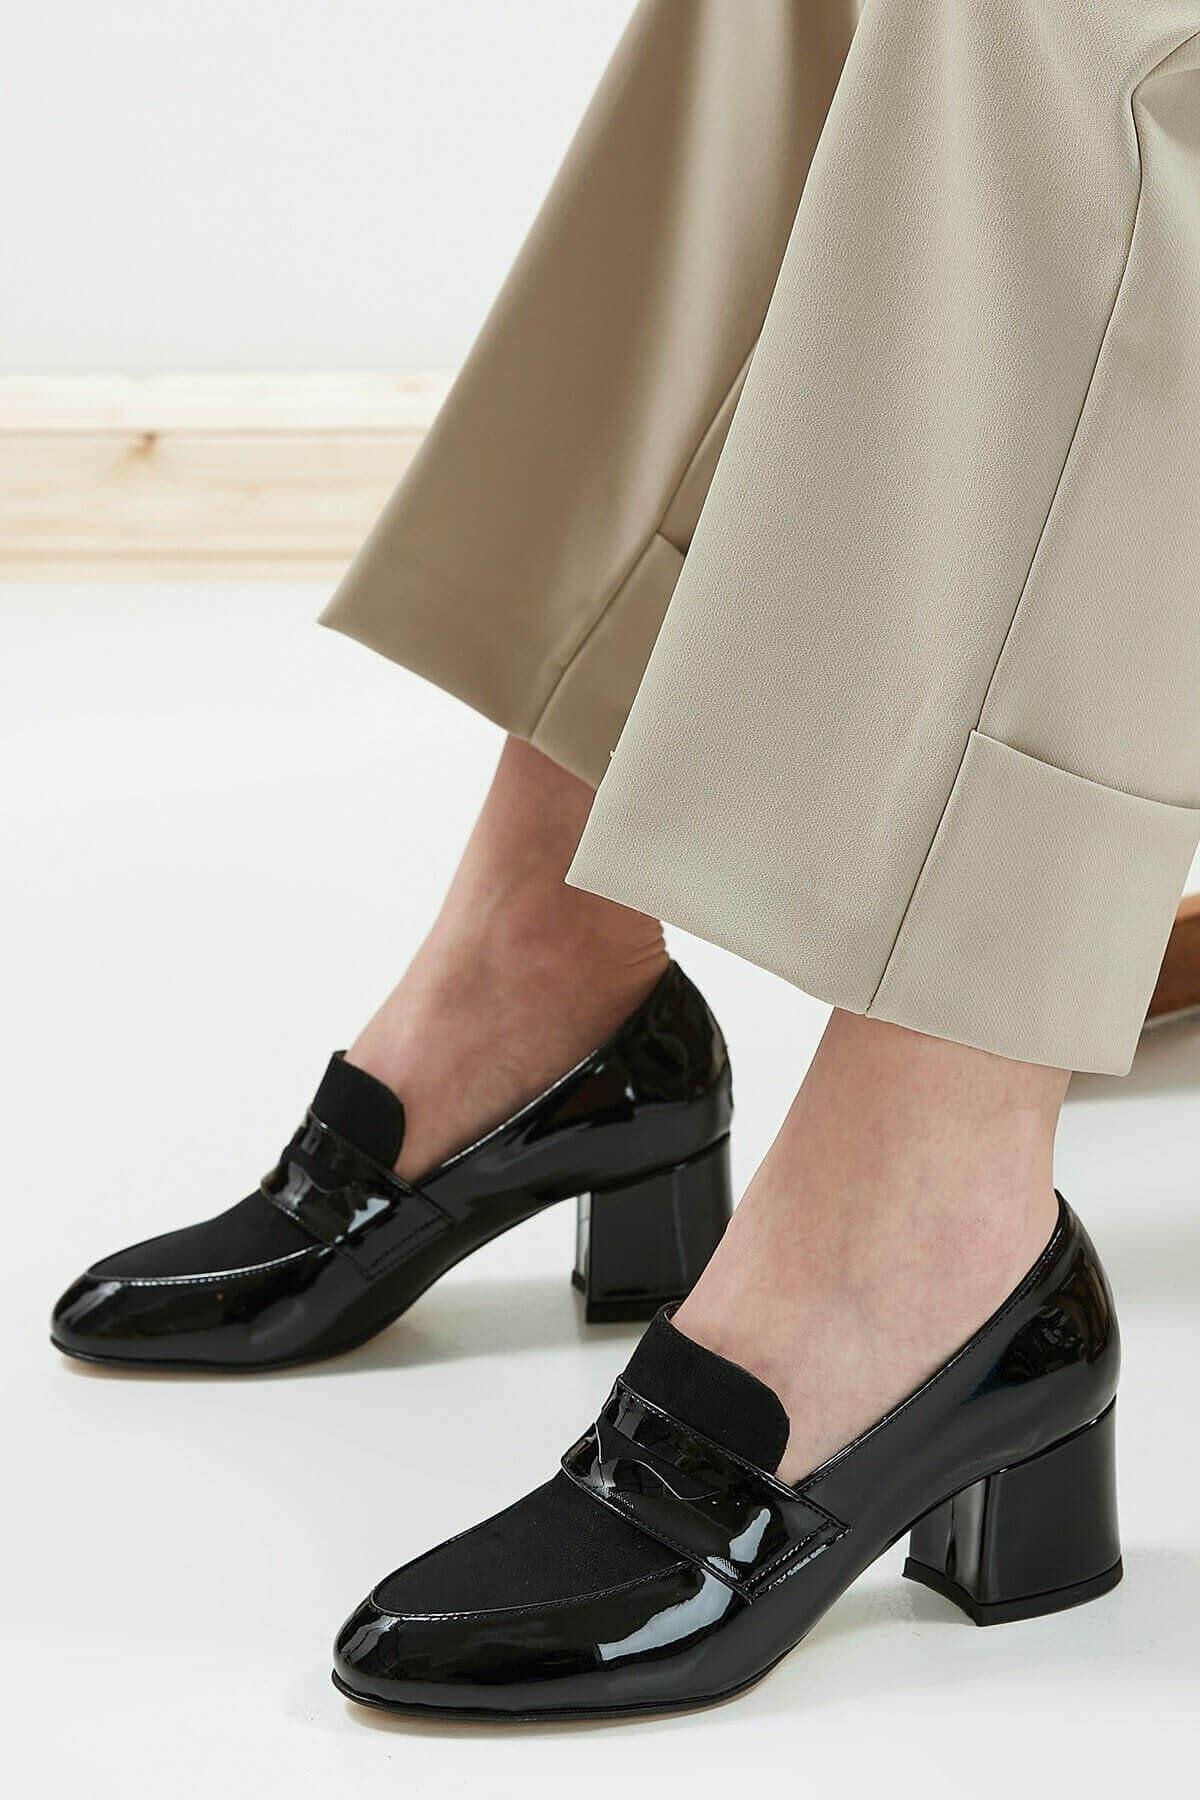 Mio Gusto Brenda Siyah Topuklu Ayakkabı 1